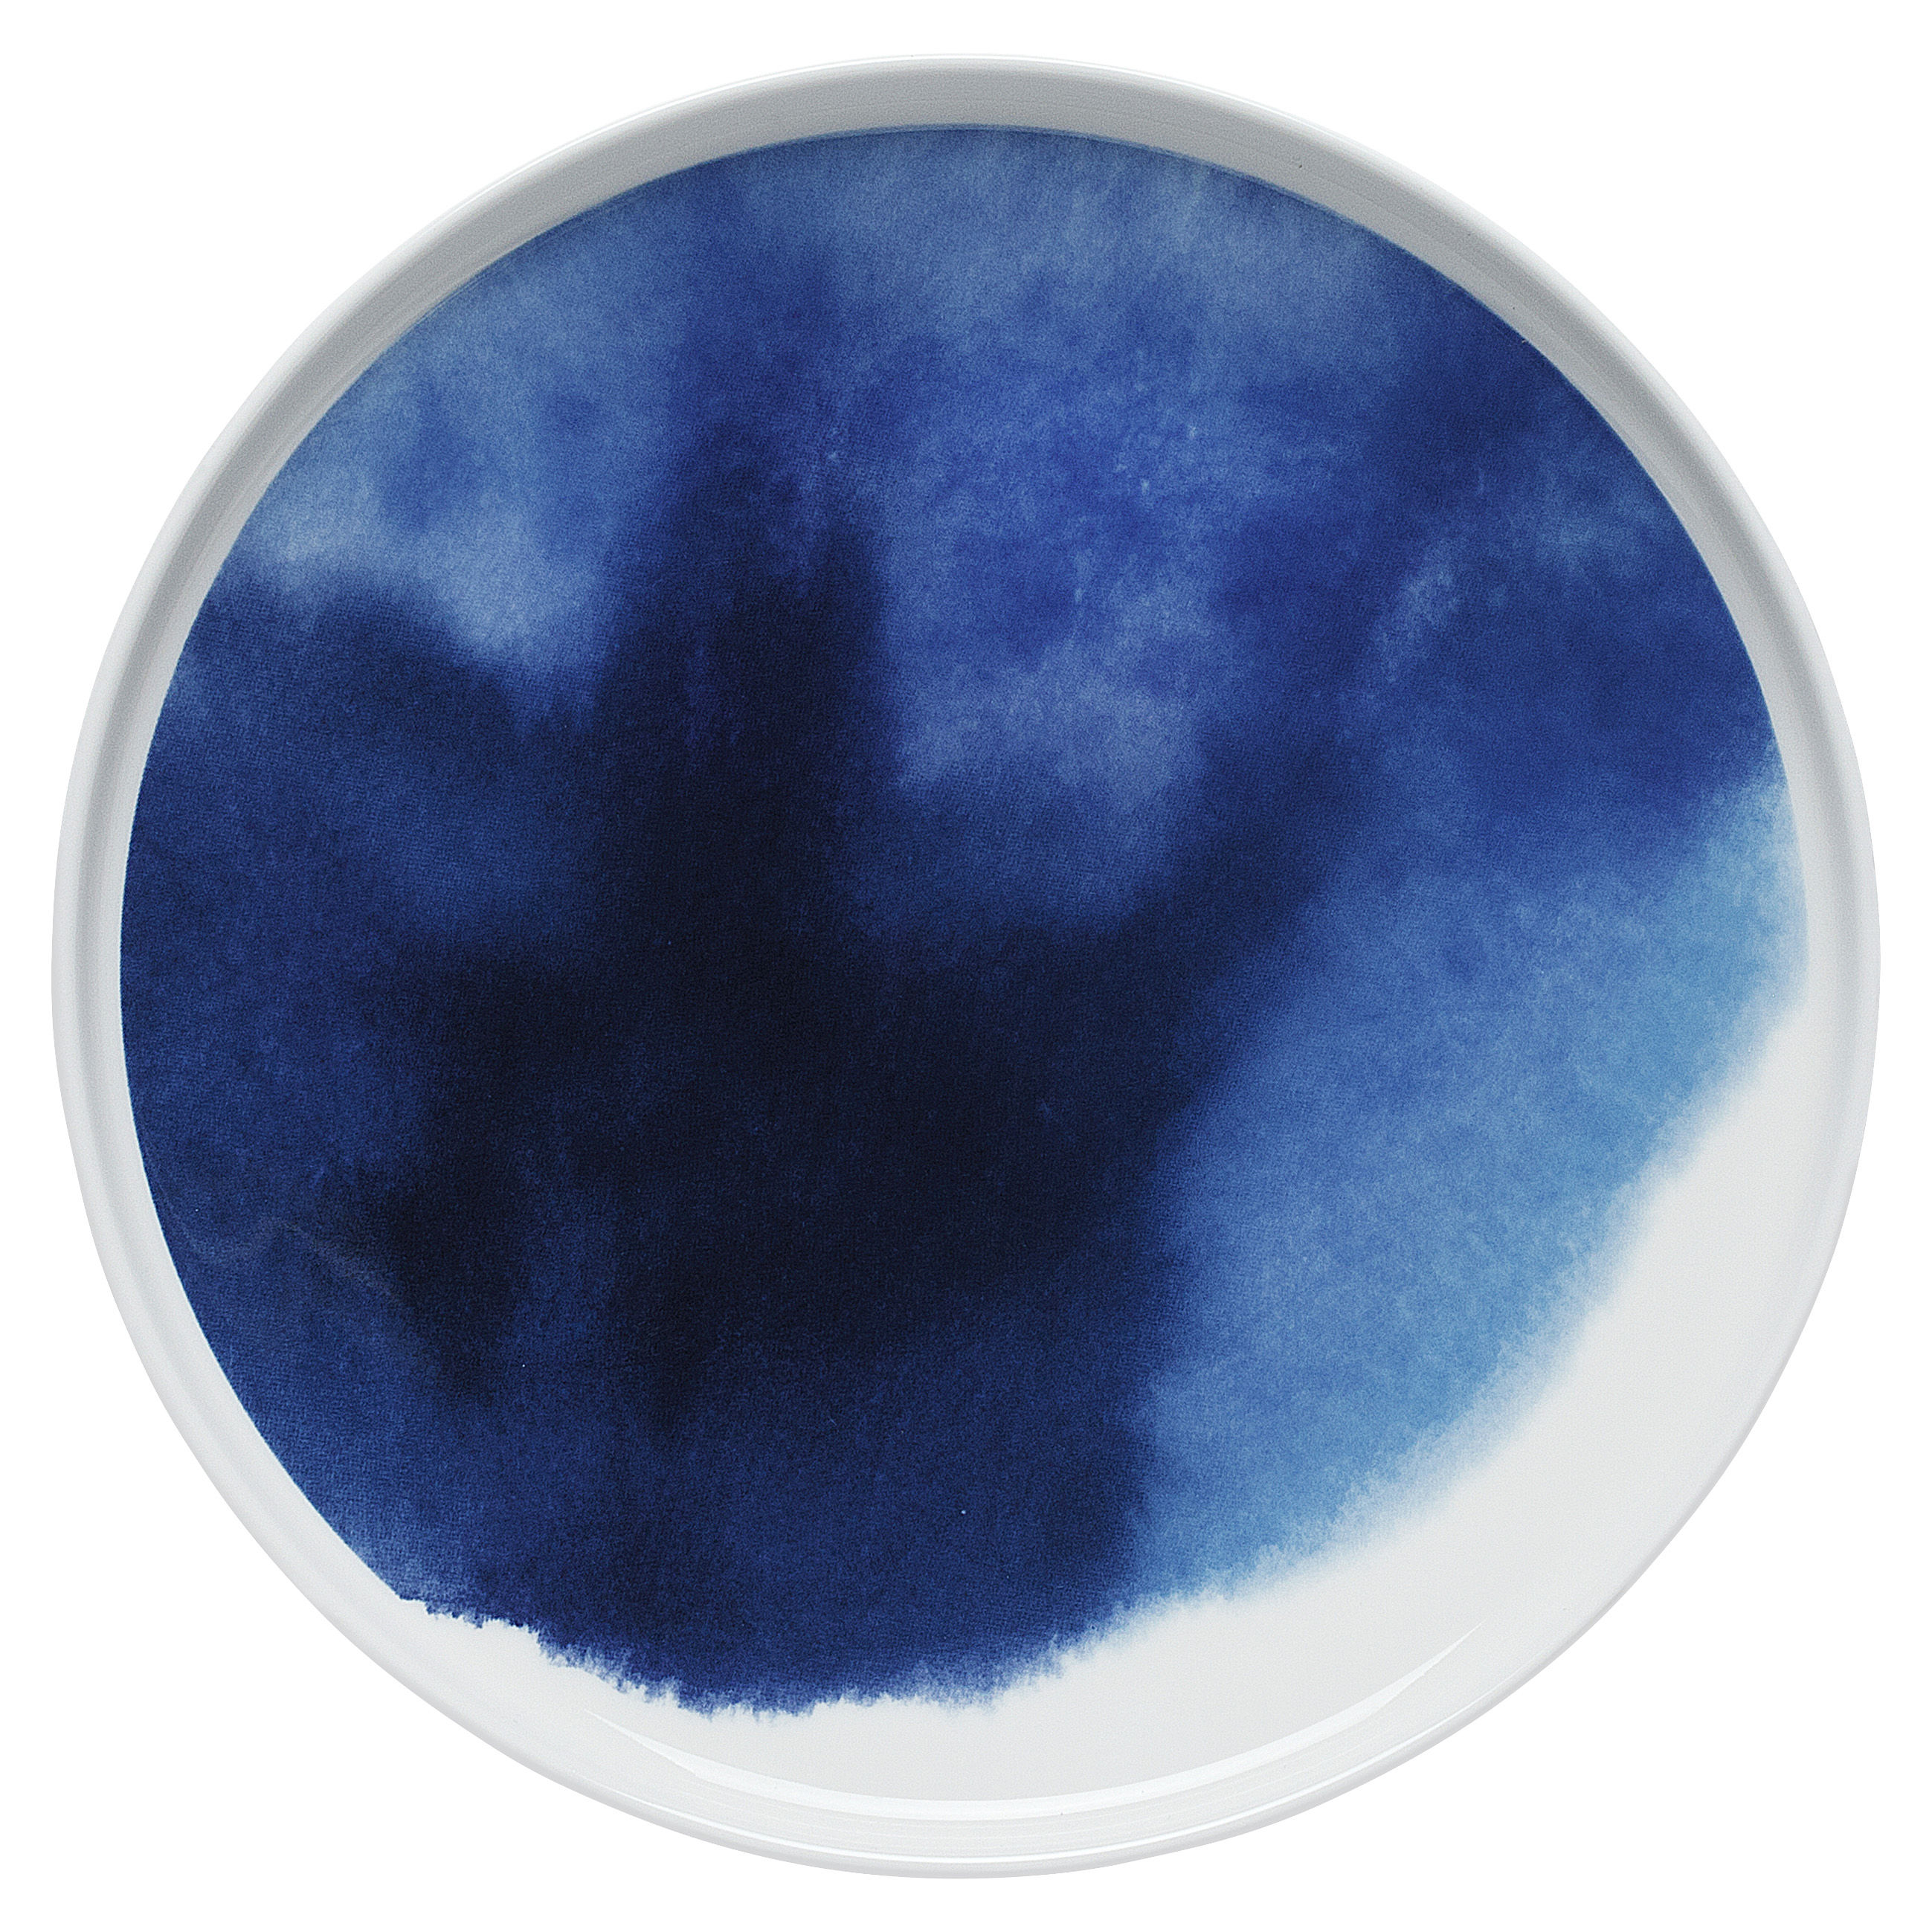 Tableware - Plates - Oiva Sääpäiväkirja Plate - Ø 25 cm by Marimekko - Sääpäiväkirja / Blue - China